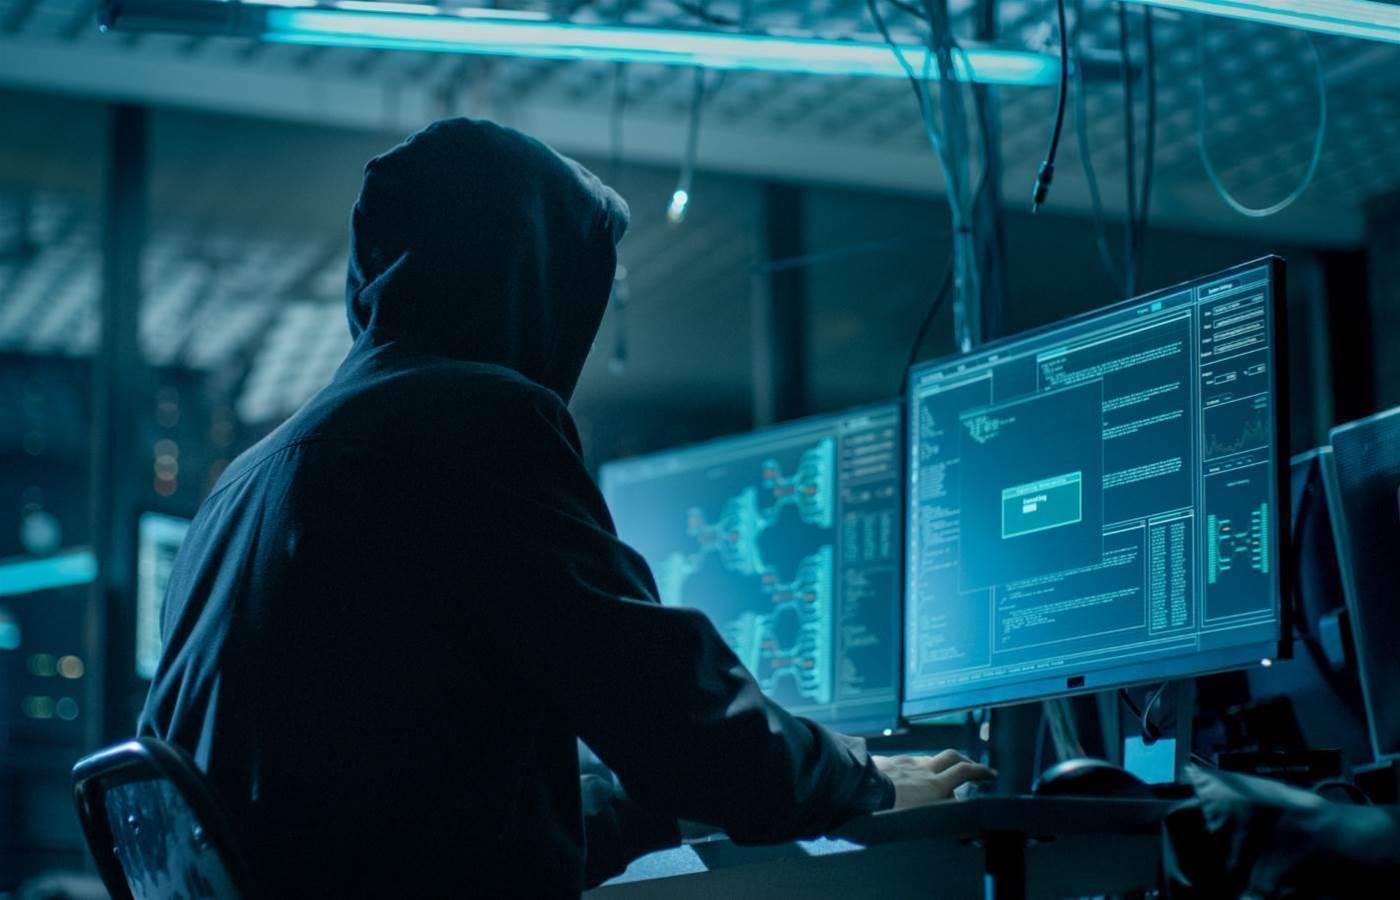 MOQdigital subsidiary caught in global data breach